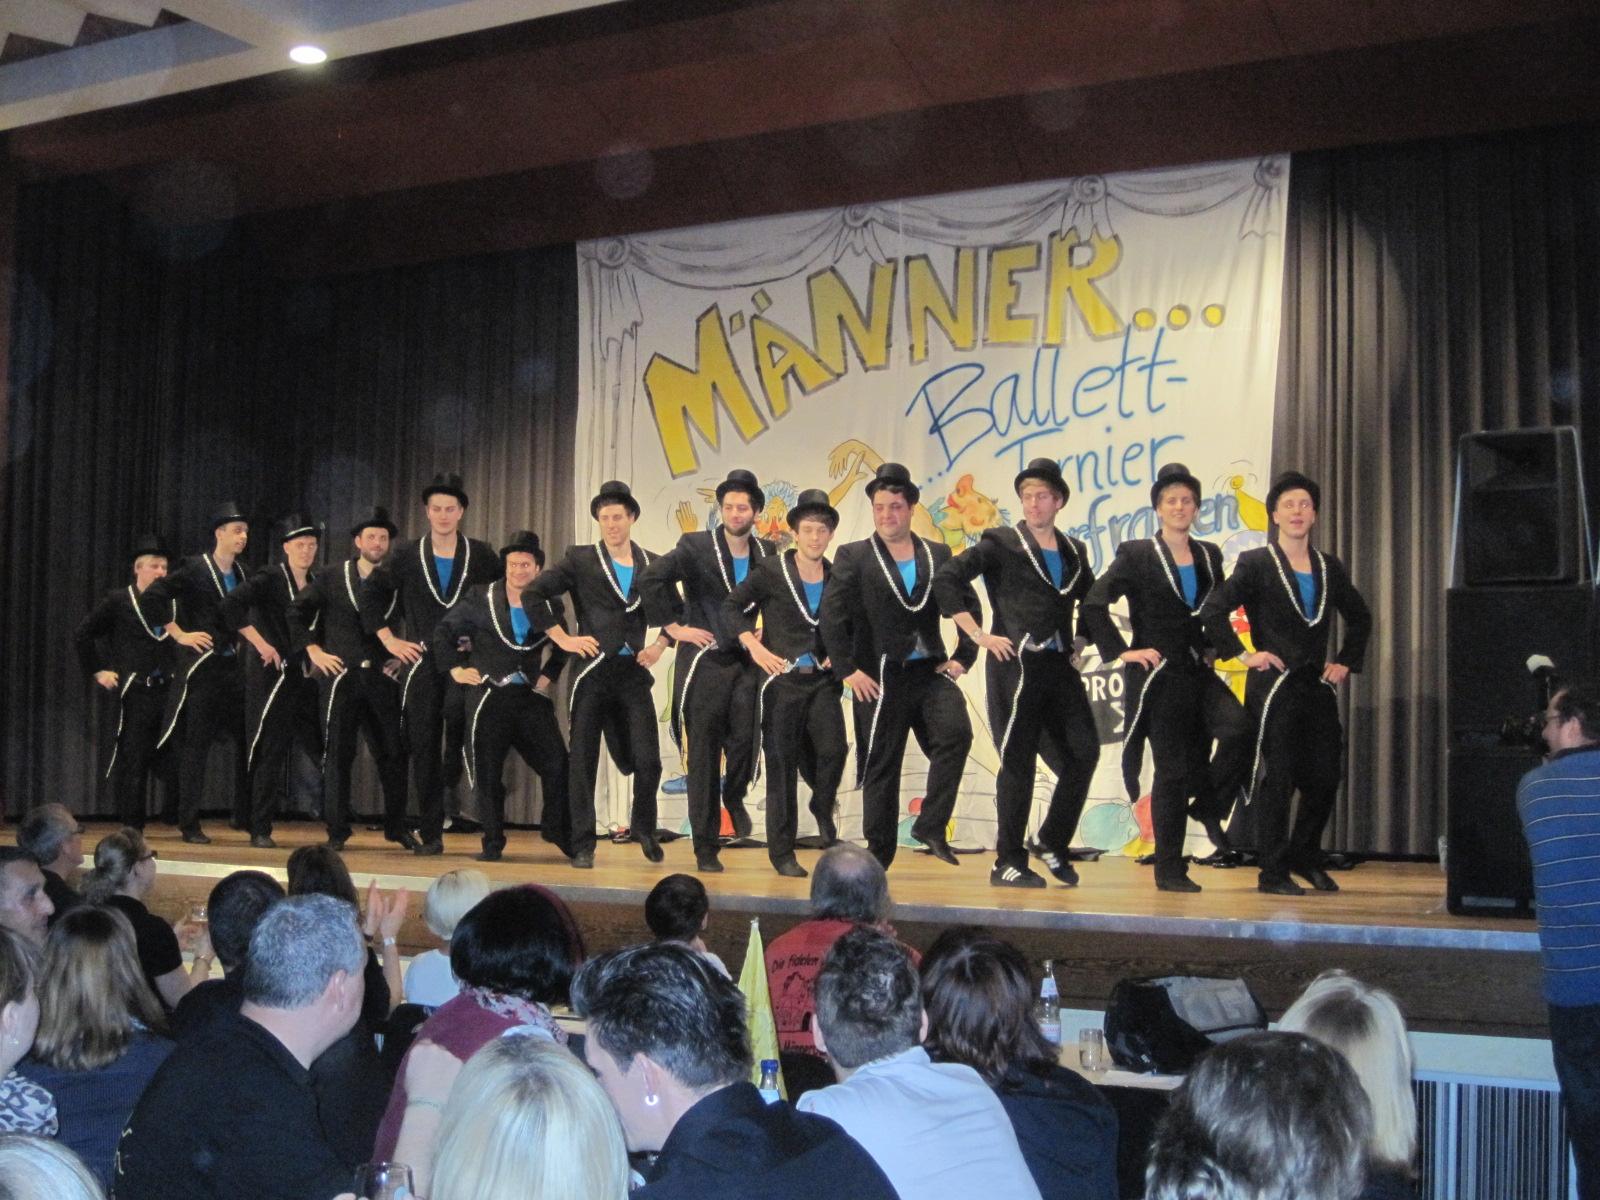 SCS-Maennerballet-2013_1